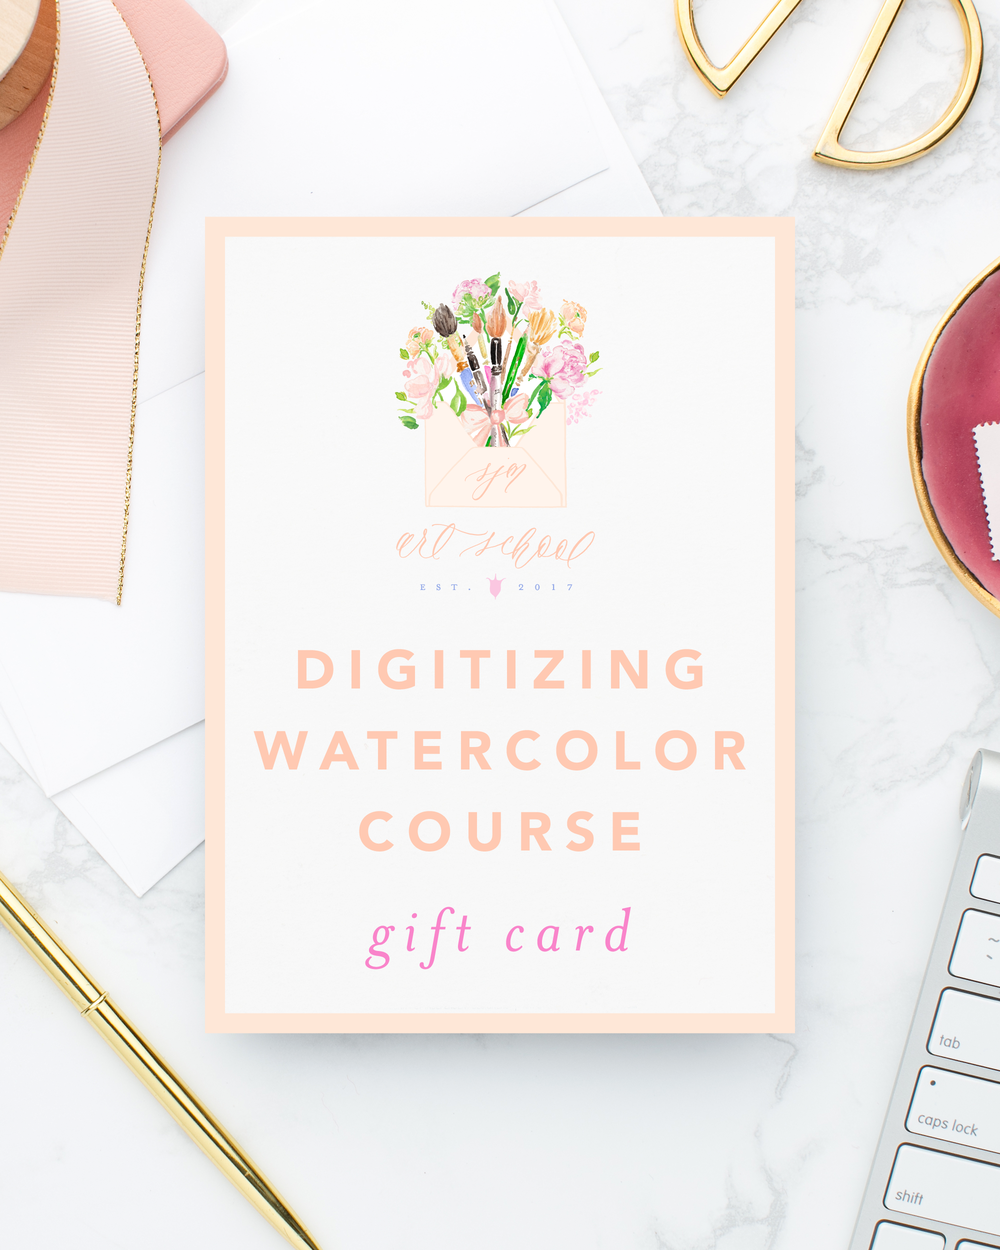 SJM Art School Digitizing Watercolors Online Course Gift Card